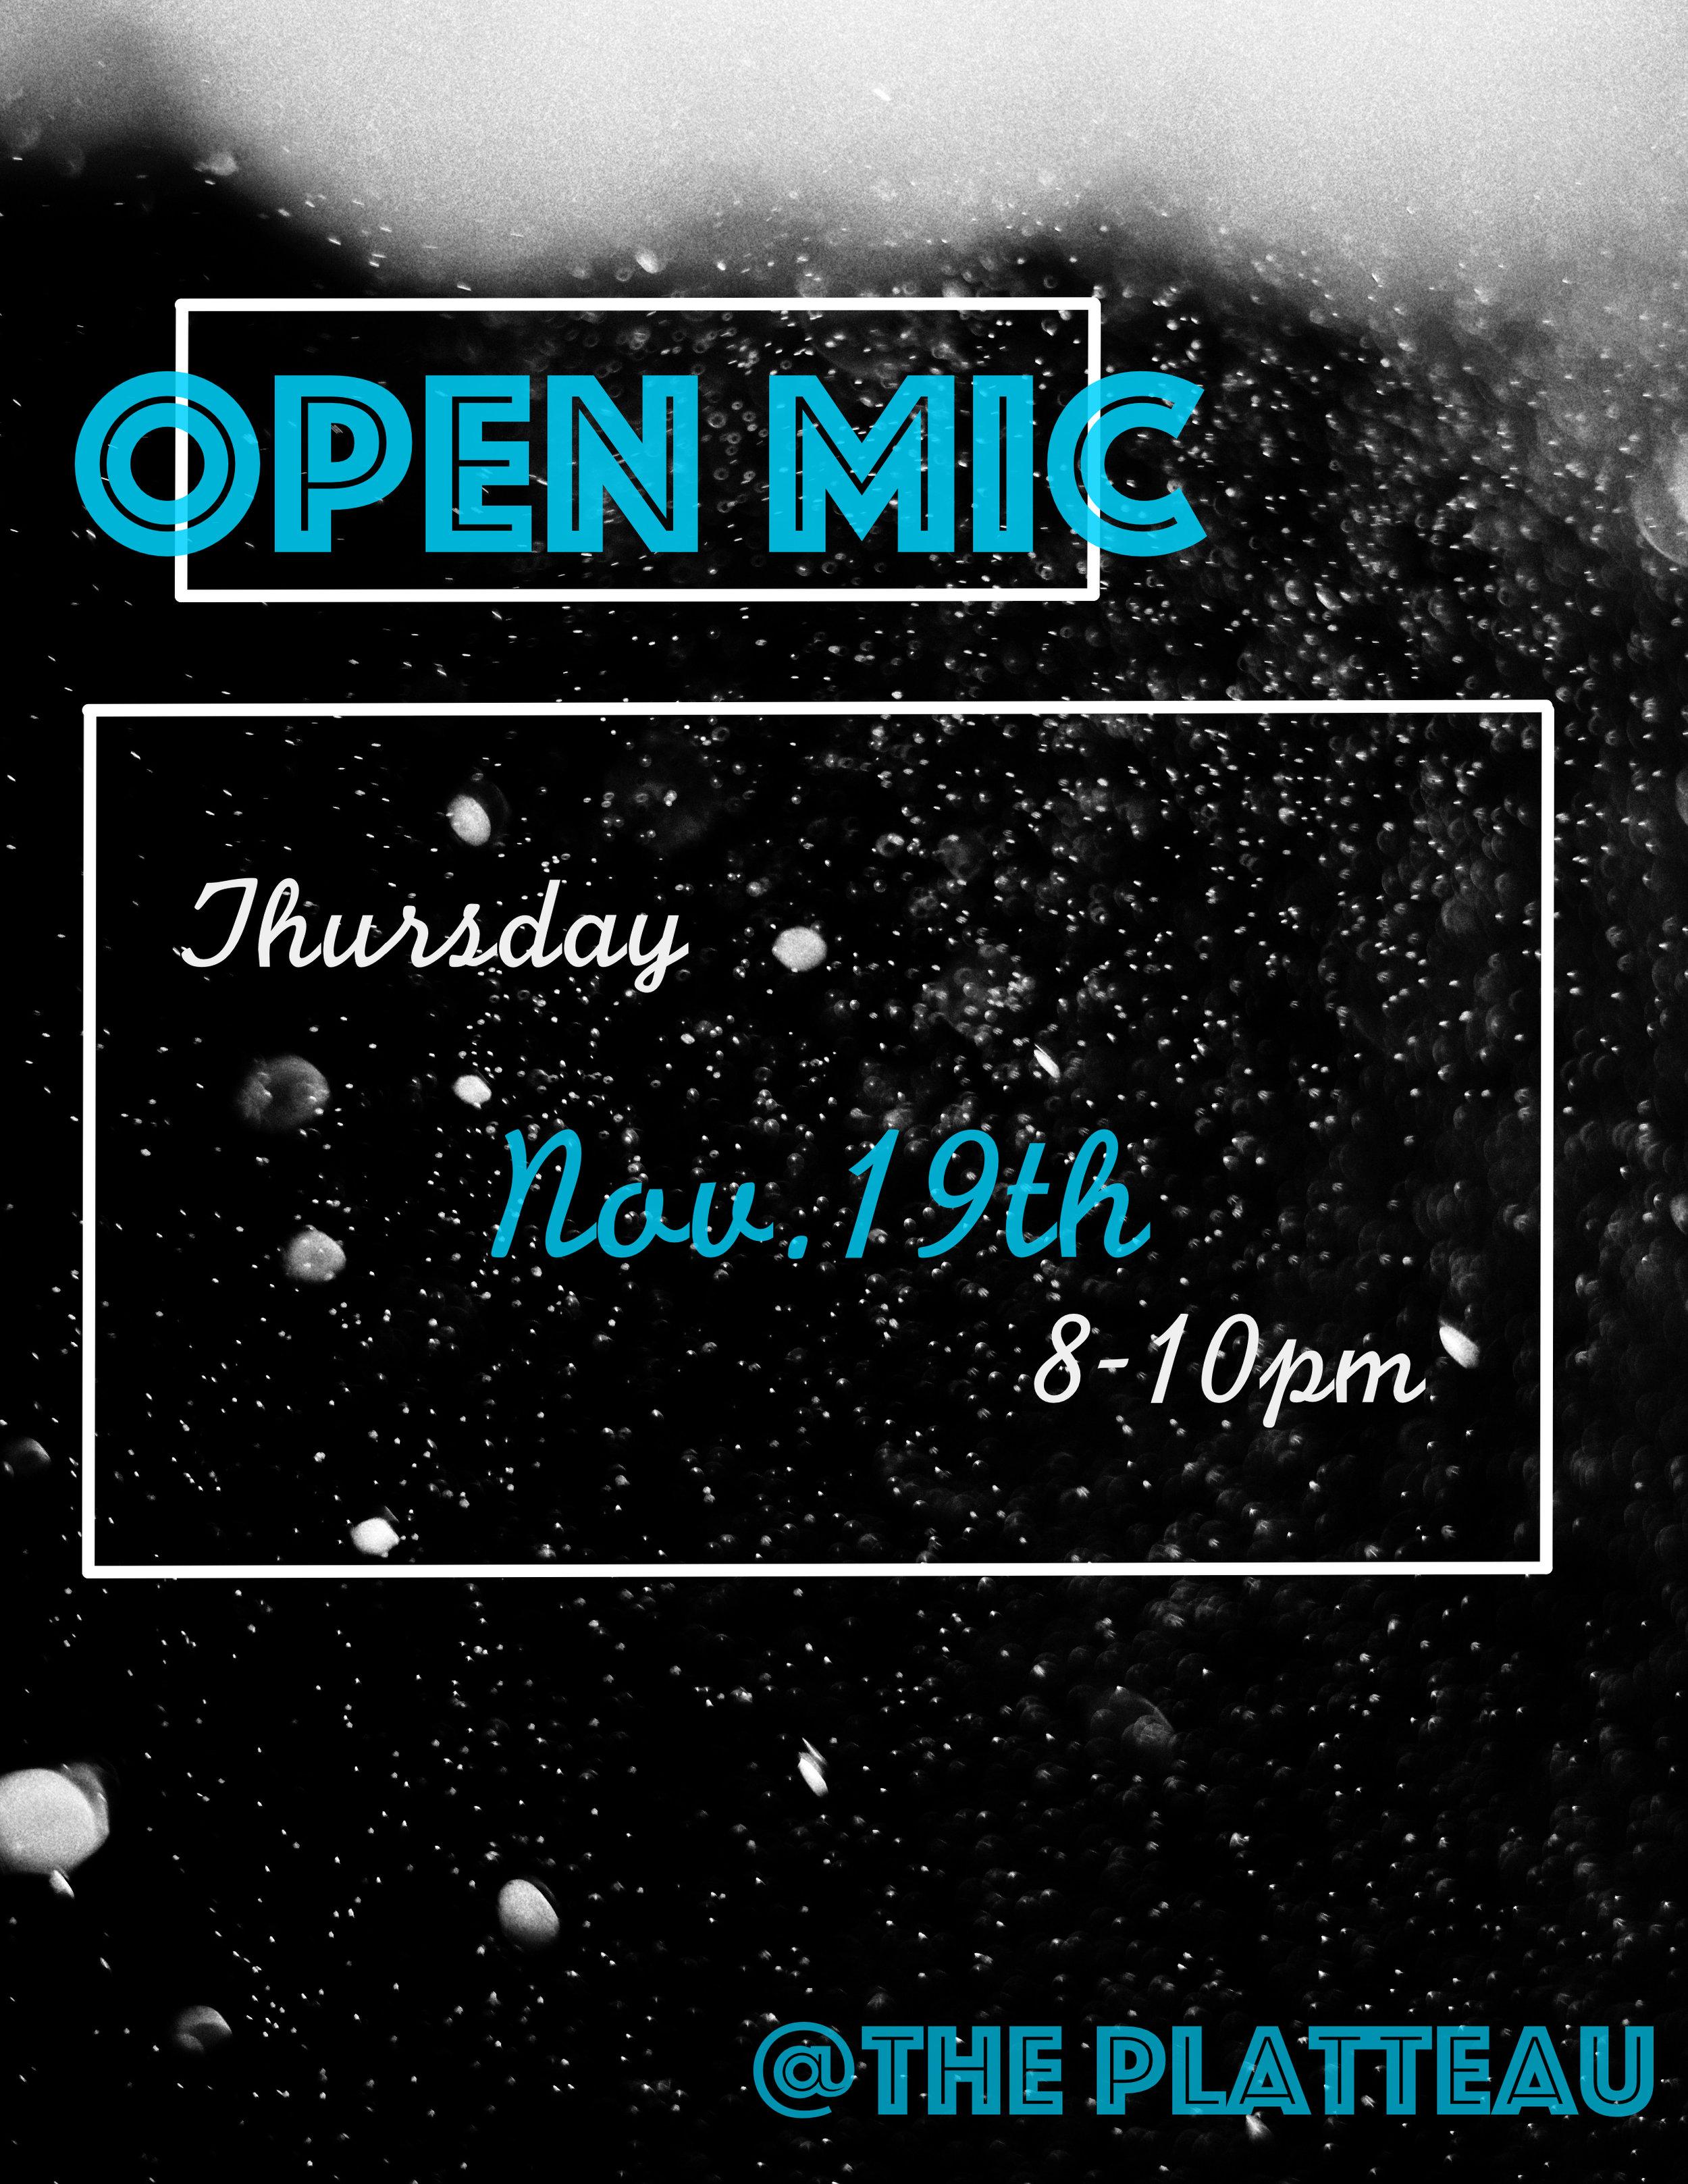 Open mic 11 something.jpg